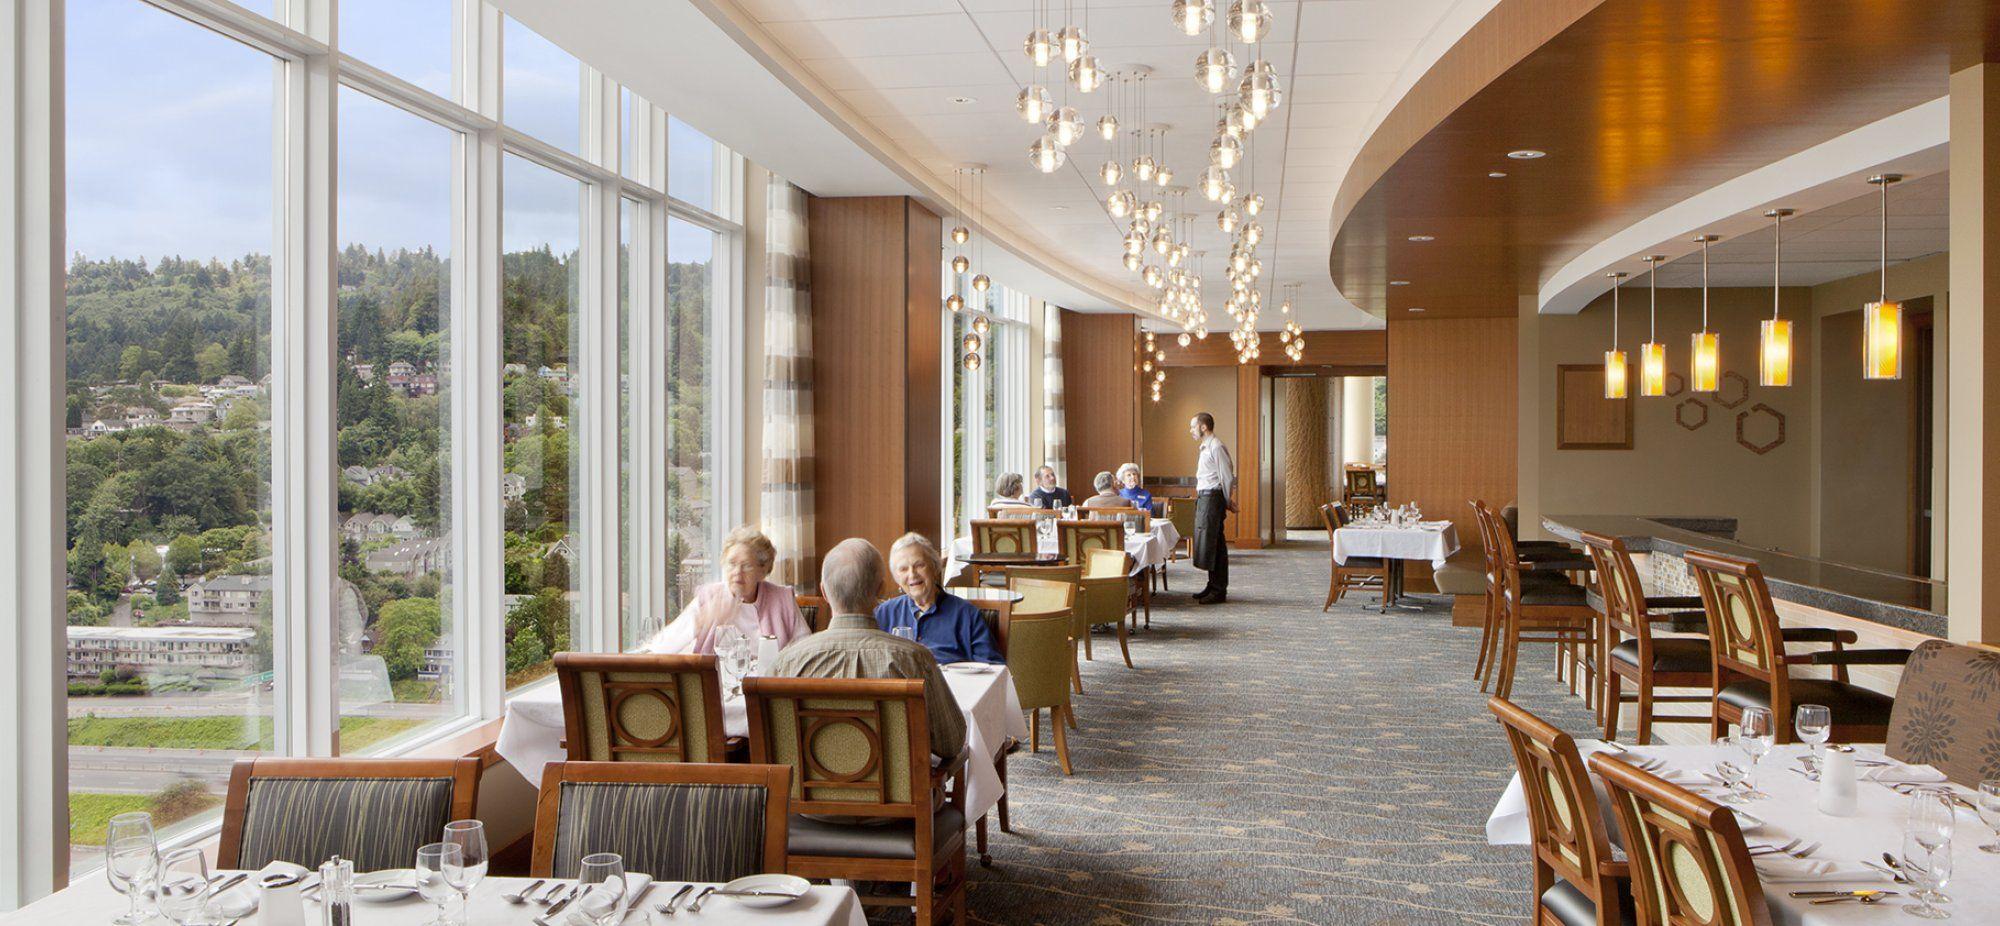 Emejing Senior Home Design Gallery - Interior Design Ideas ...